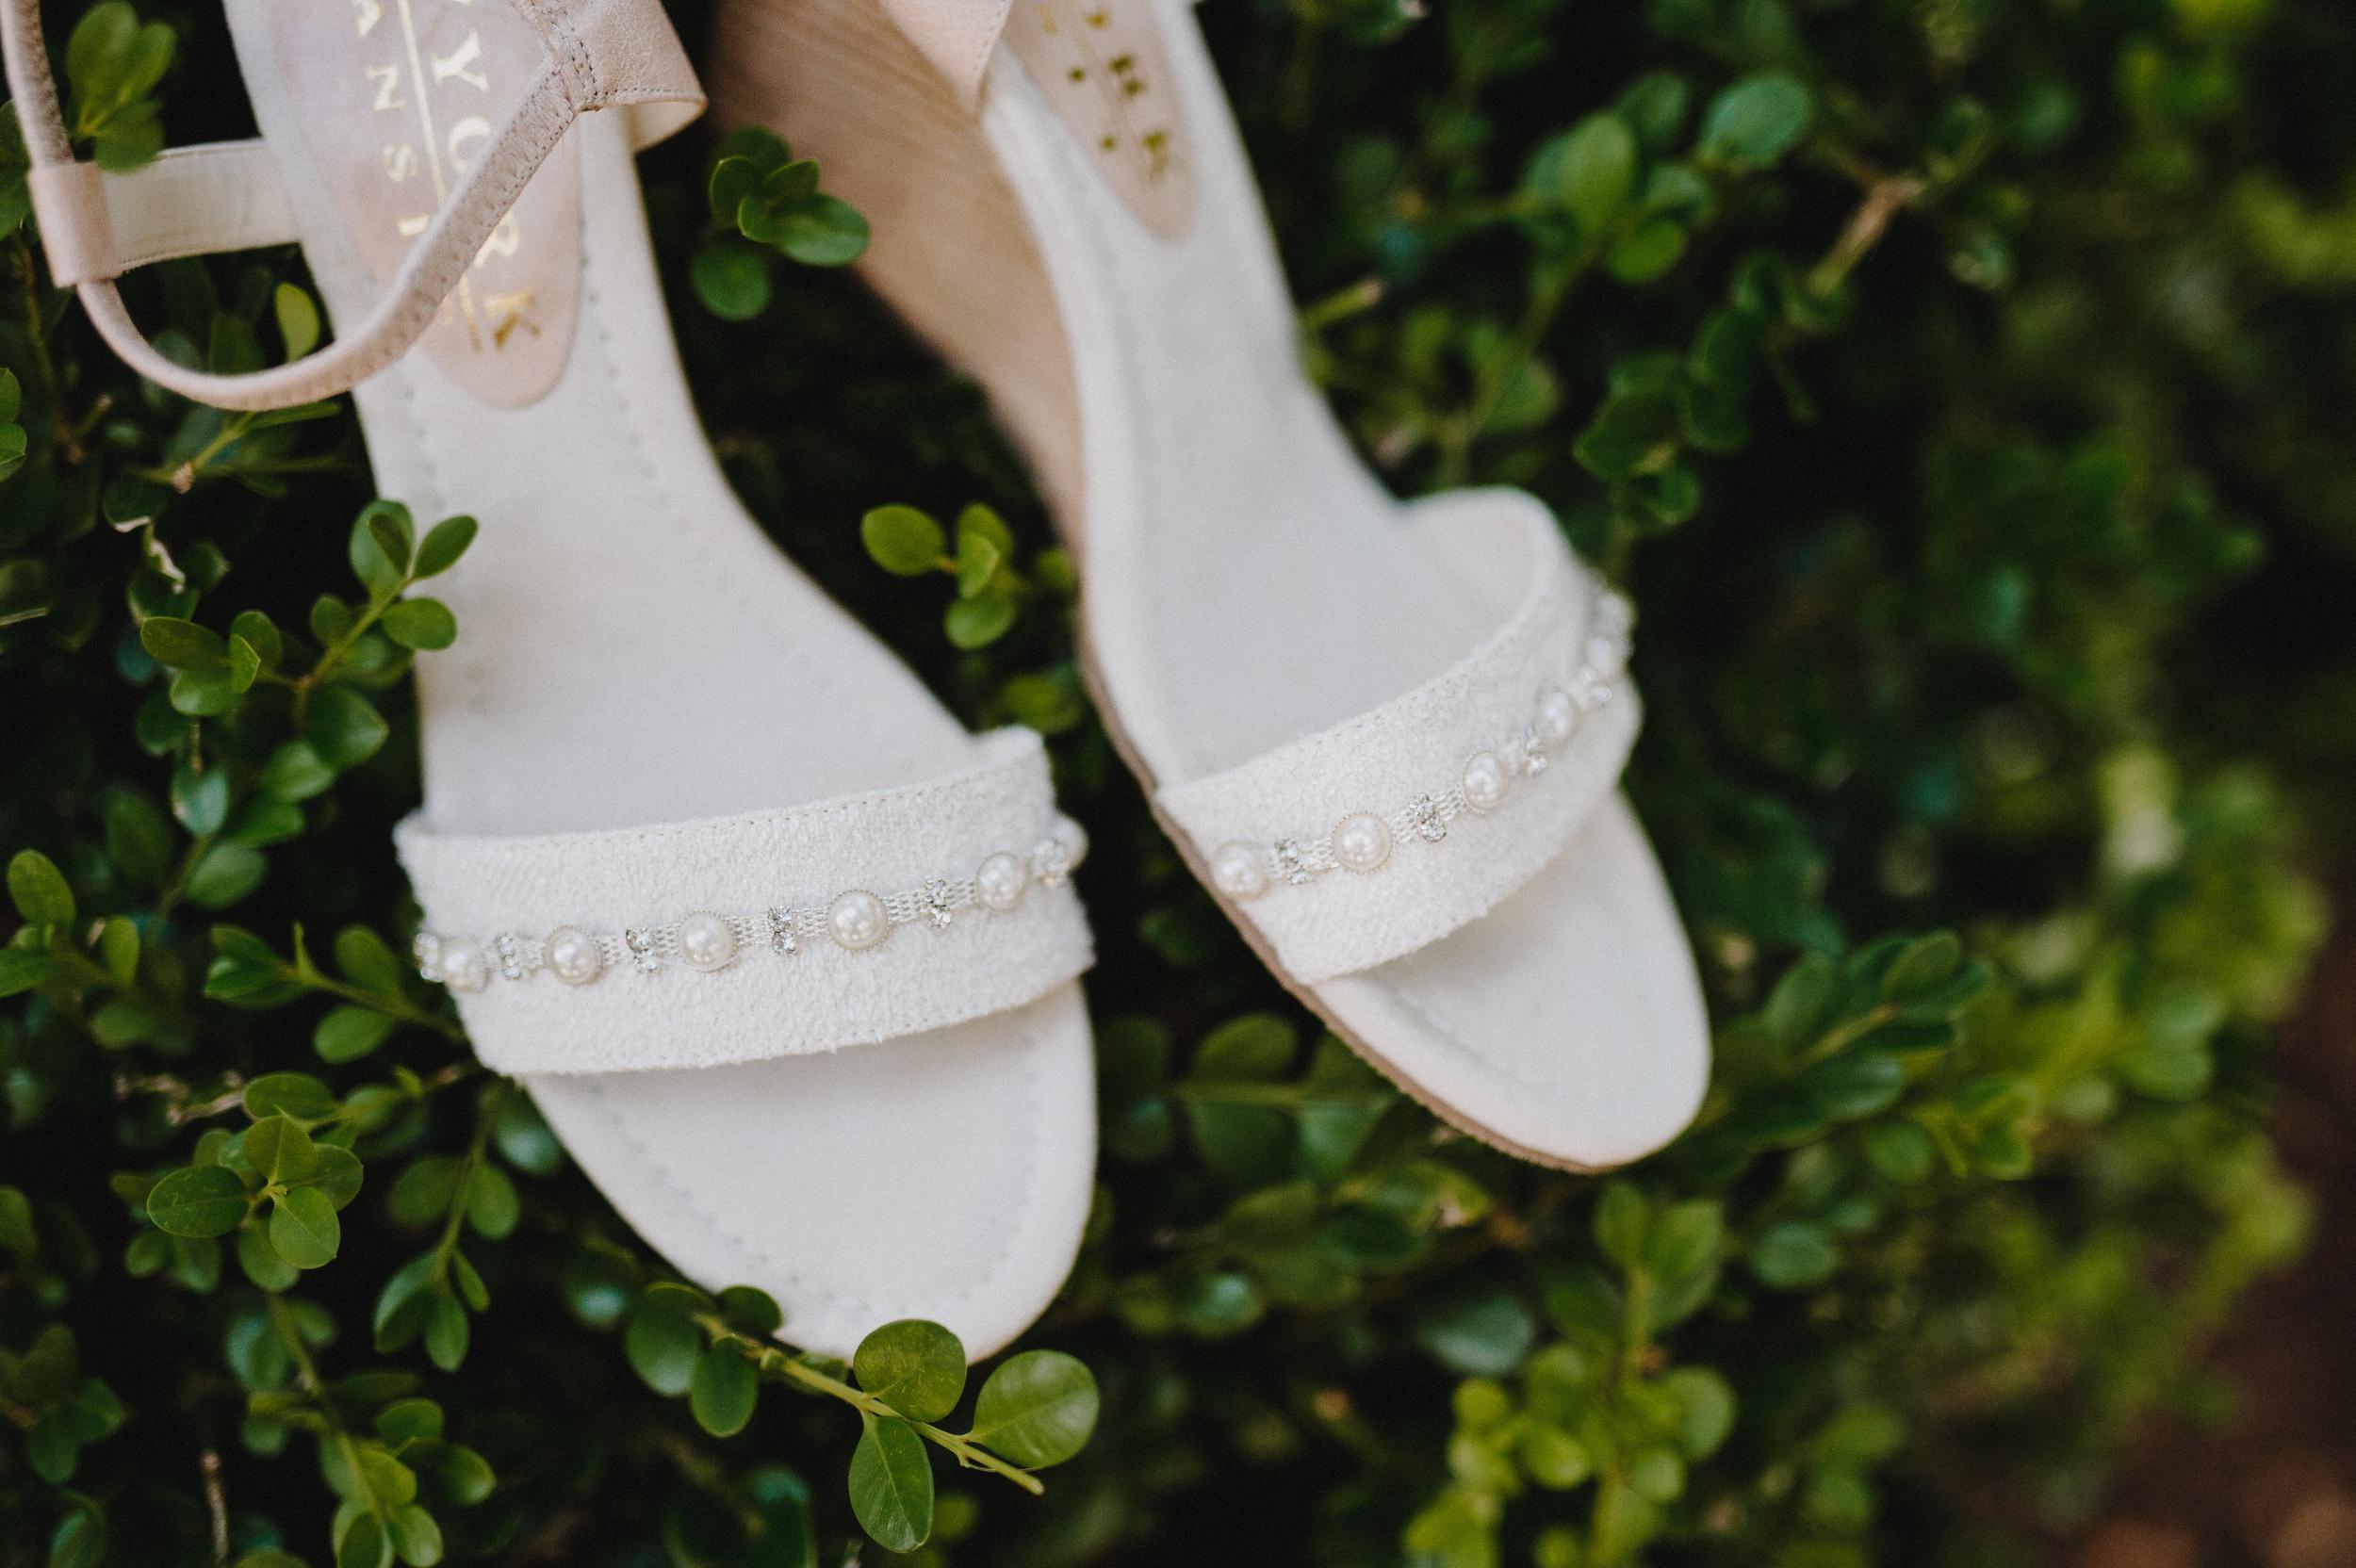 holly-hedge-estate-wedding-photographer-pat-robinson-photography-3.jpg